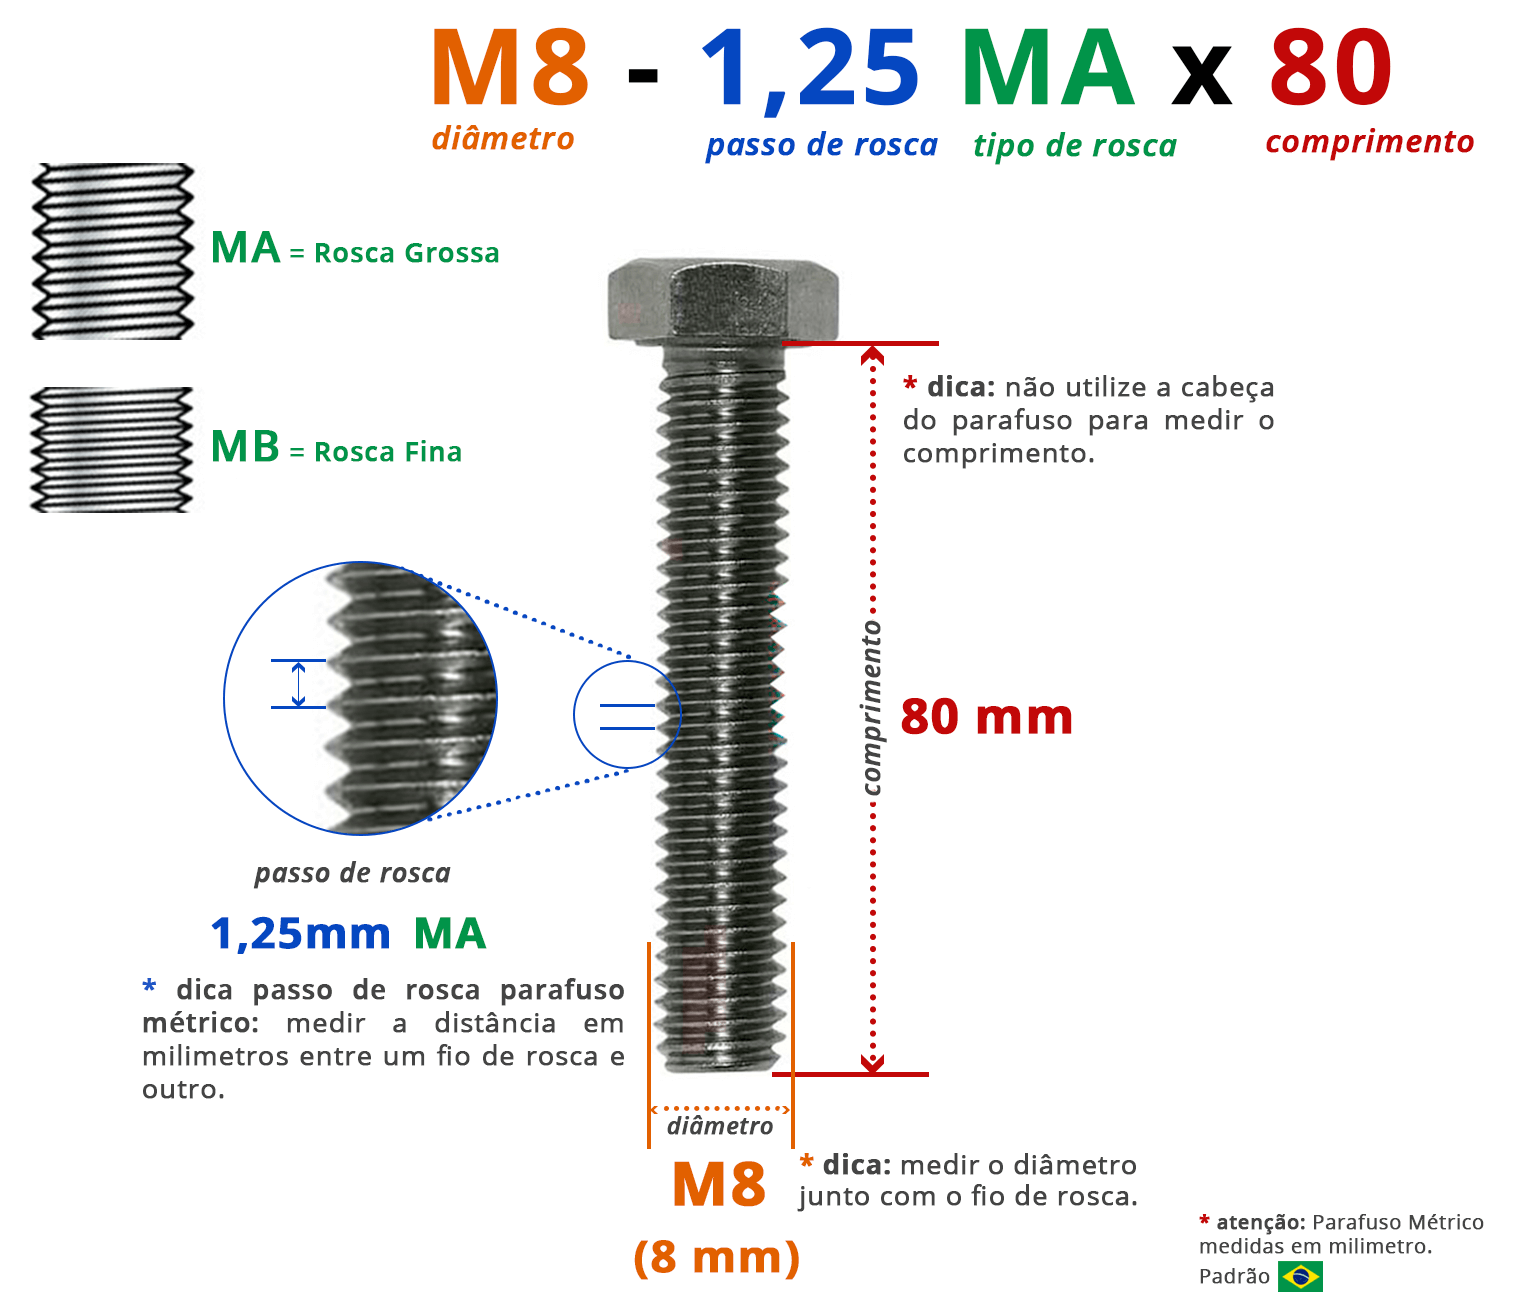 PARAFUSO SEXTAVADO ROSCA INTEIRA M8 1,25 MA X 80 DIN 933 INOX A4